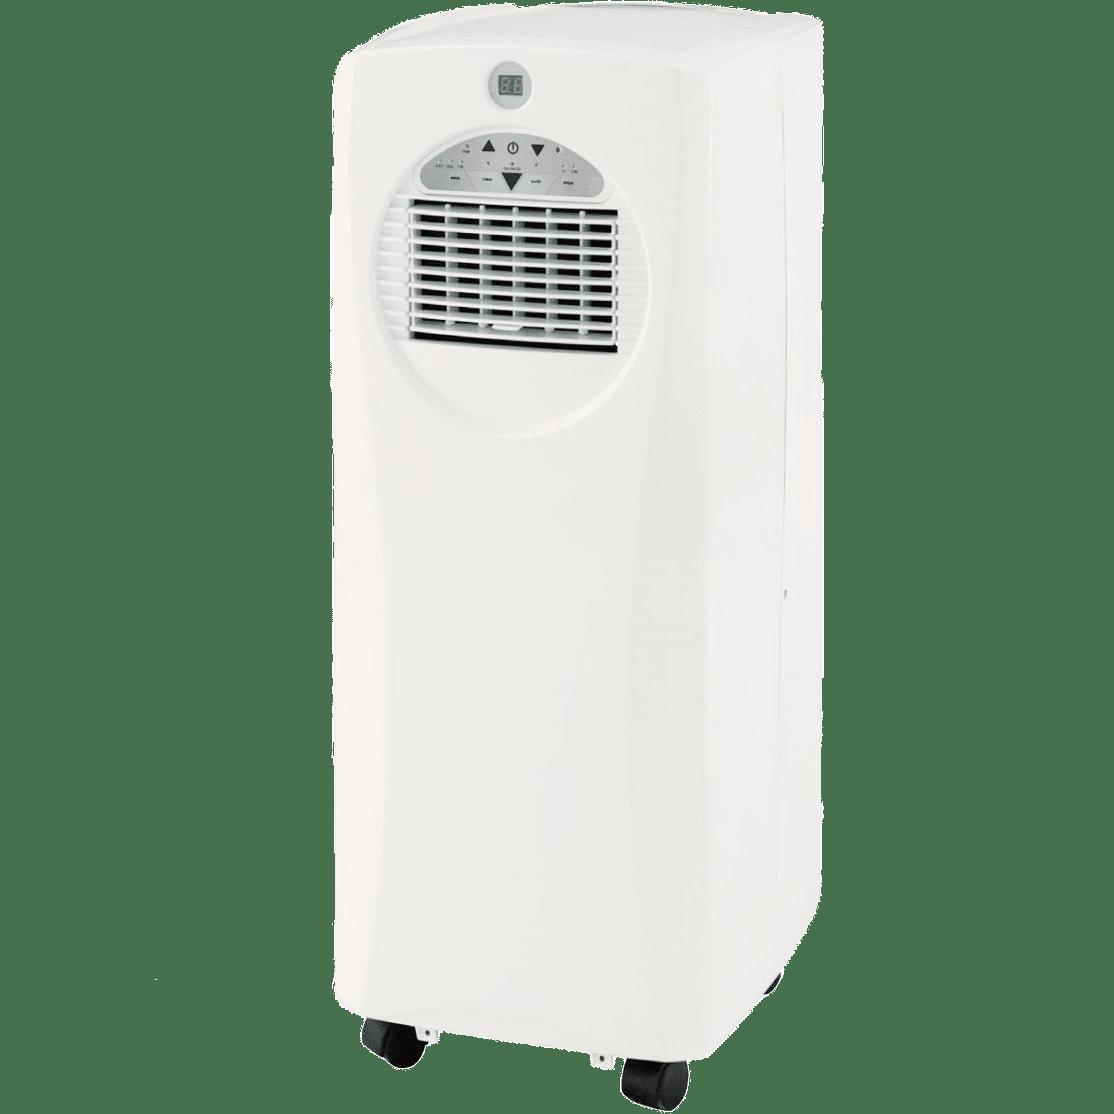 Soleus air 8000 btu portable air conditioner - Sunpentown Spt Wa 9061h 9 000 Btu Portable Ac Heater